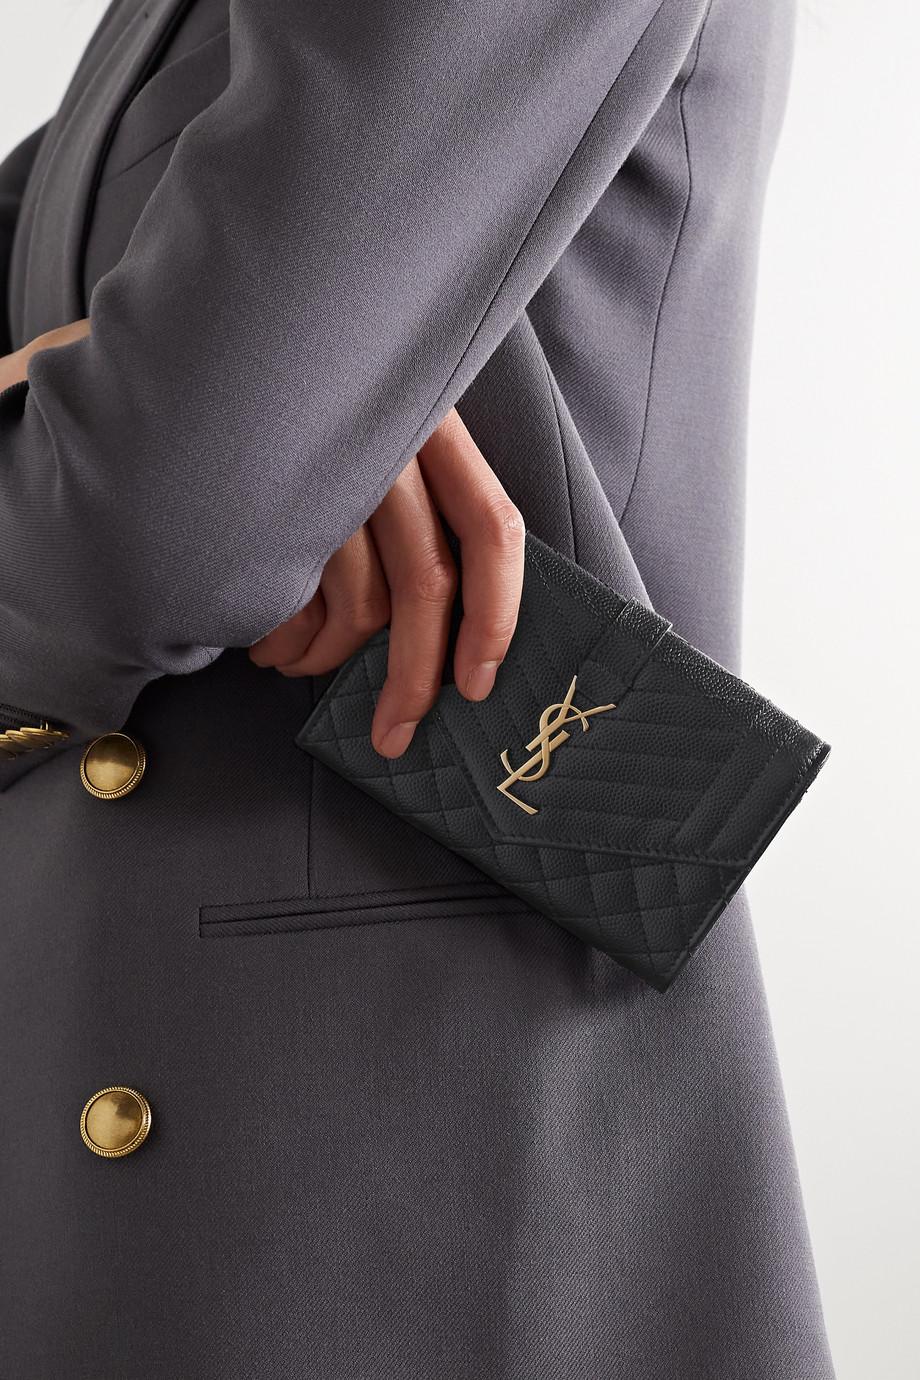 SAINT LAURENT Envelope quilted textured-leather wallet